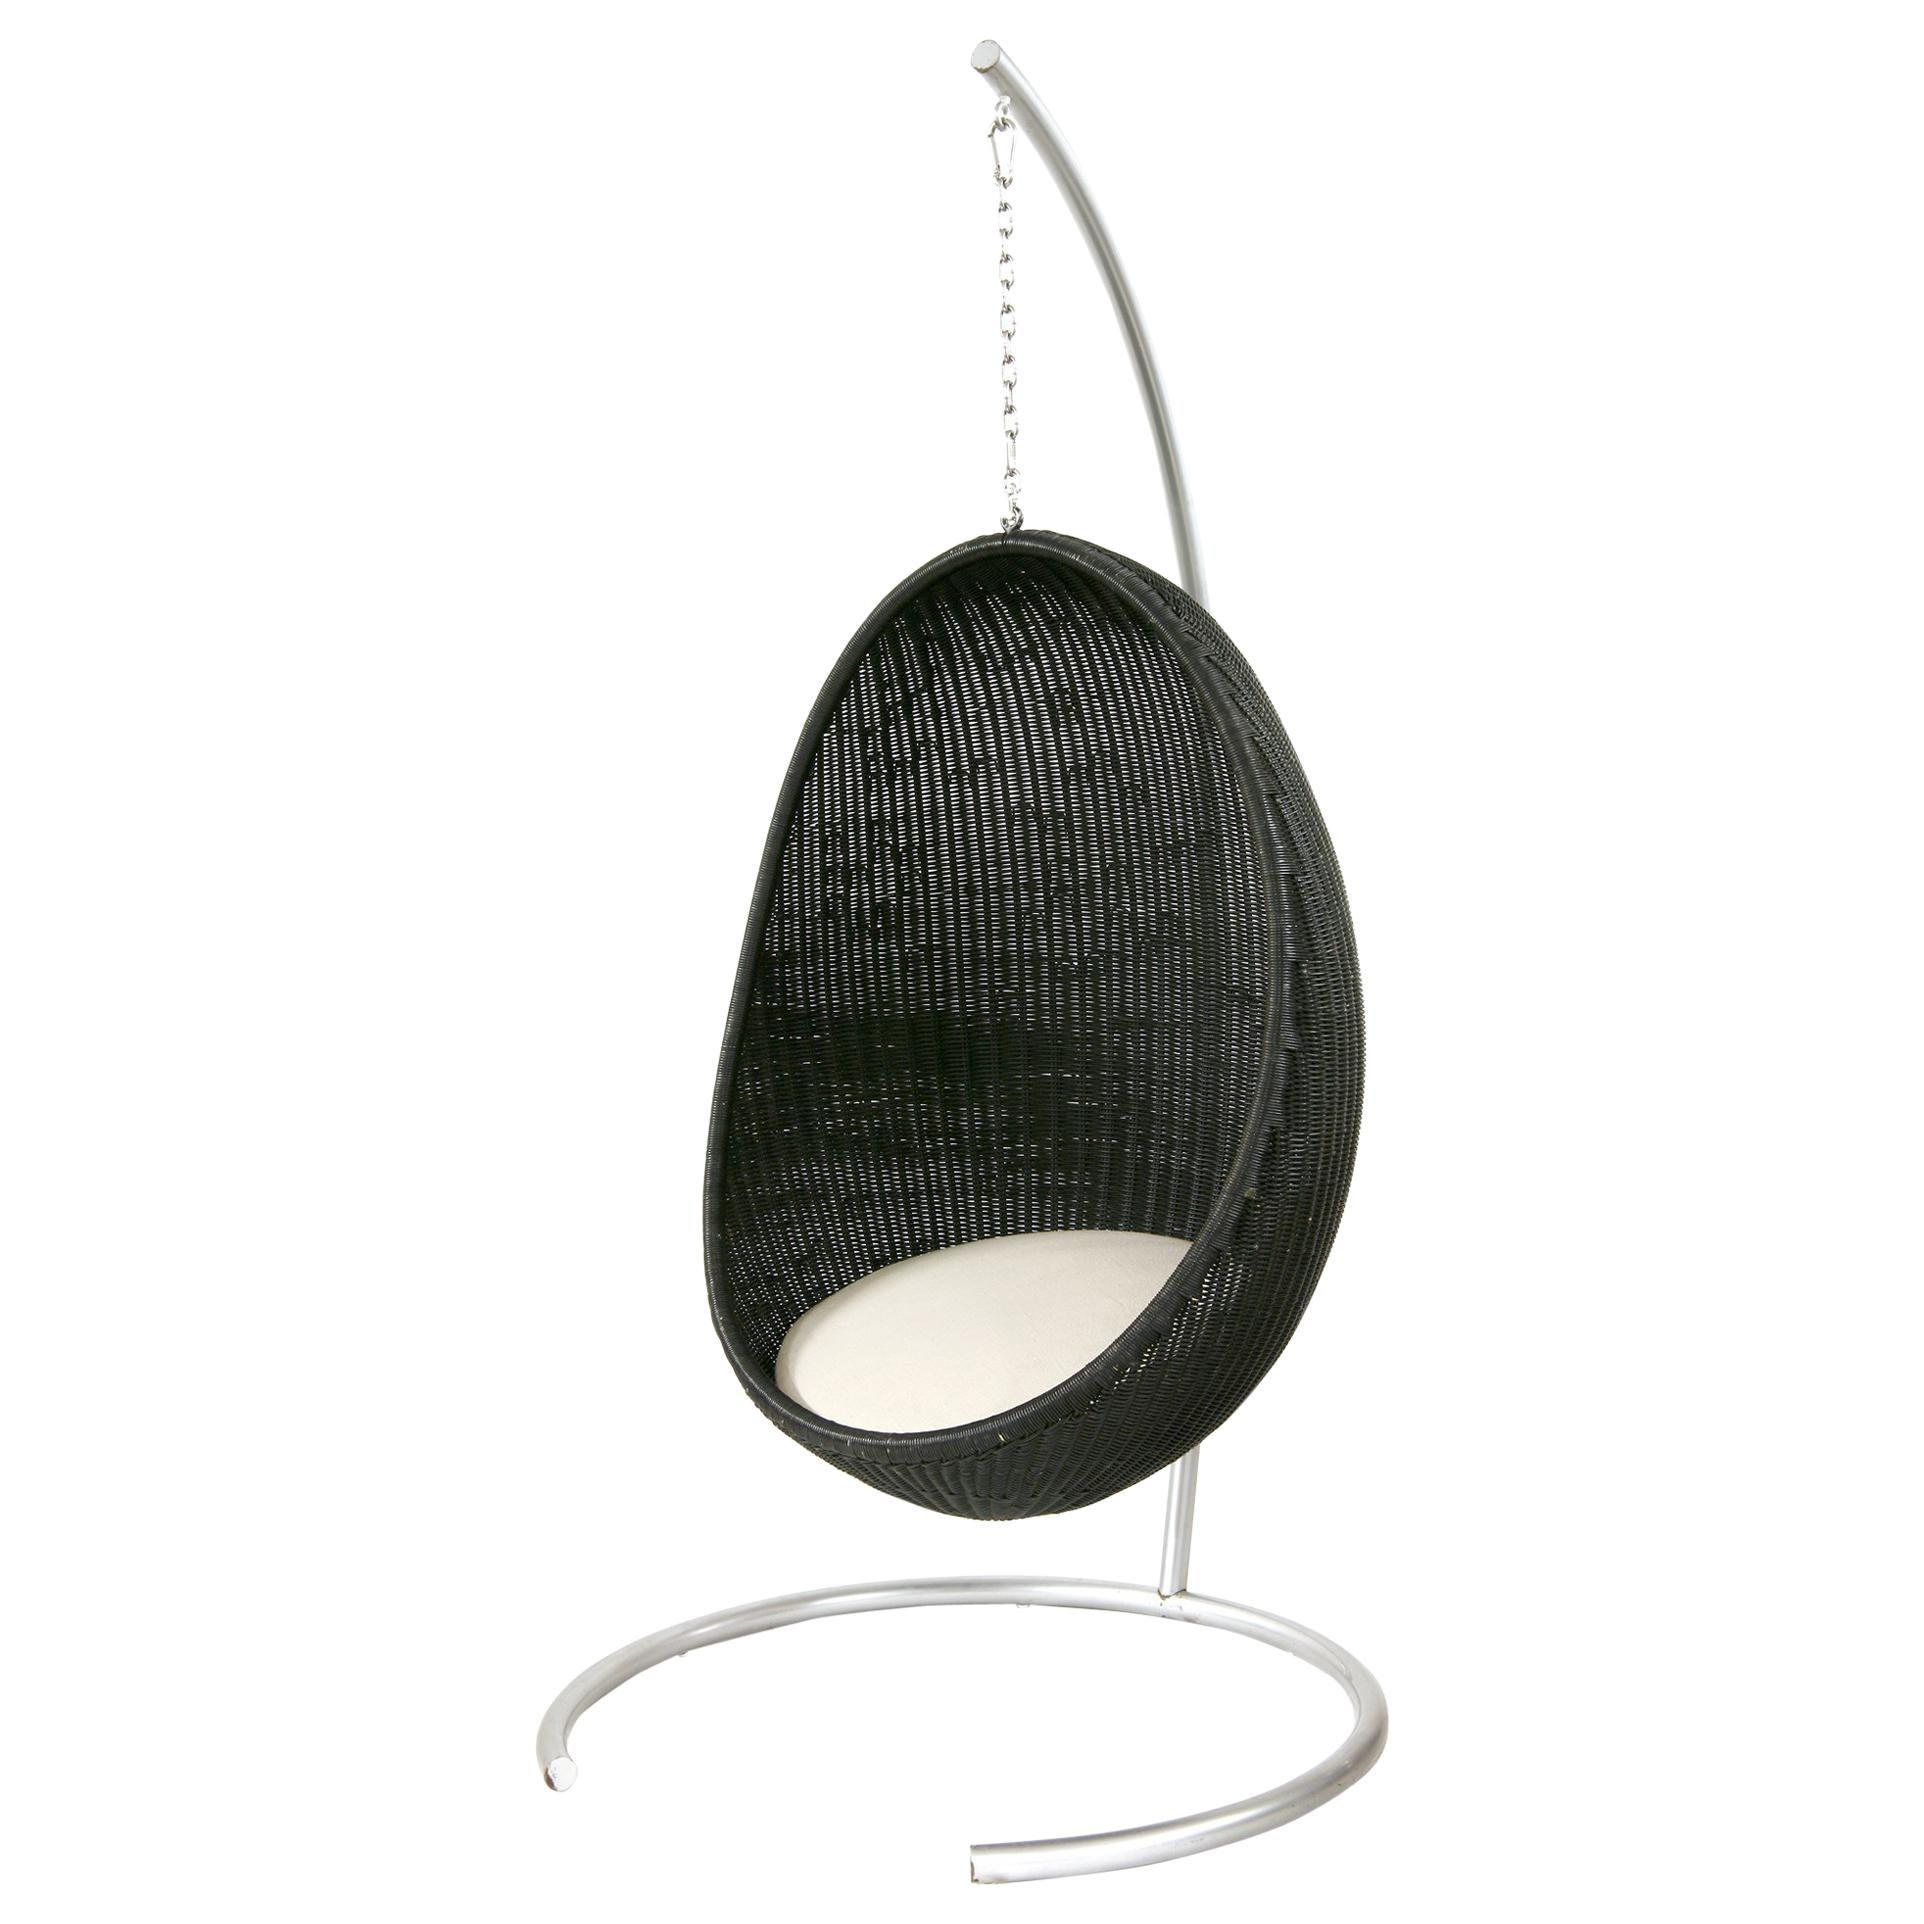 Nanna & Jorgen Ditzel Design Hanging Black Lacquered Rattan Egg Chair